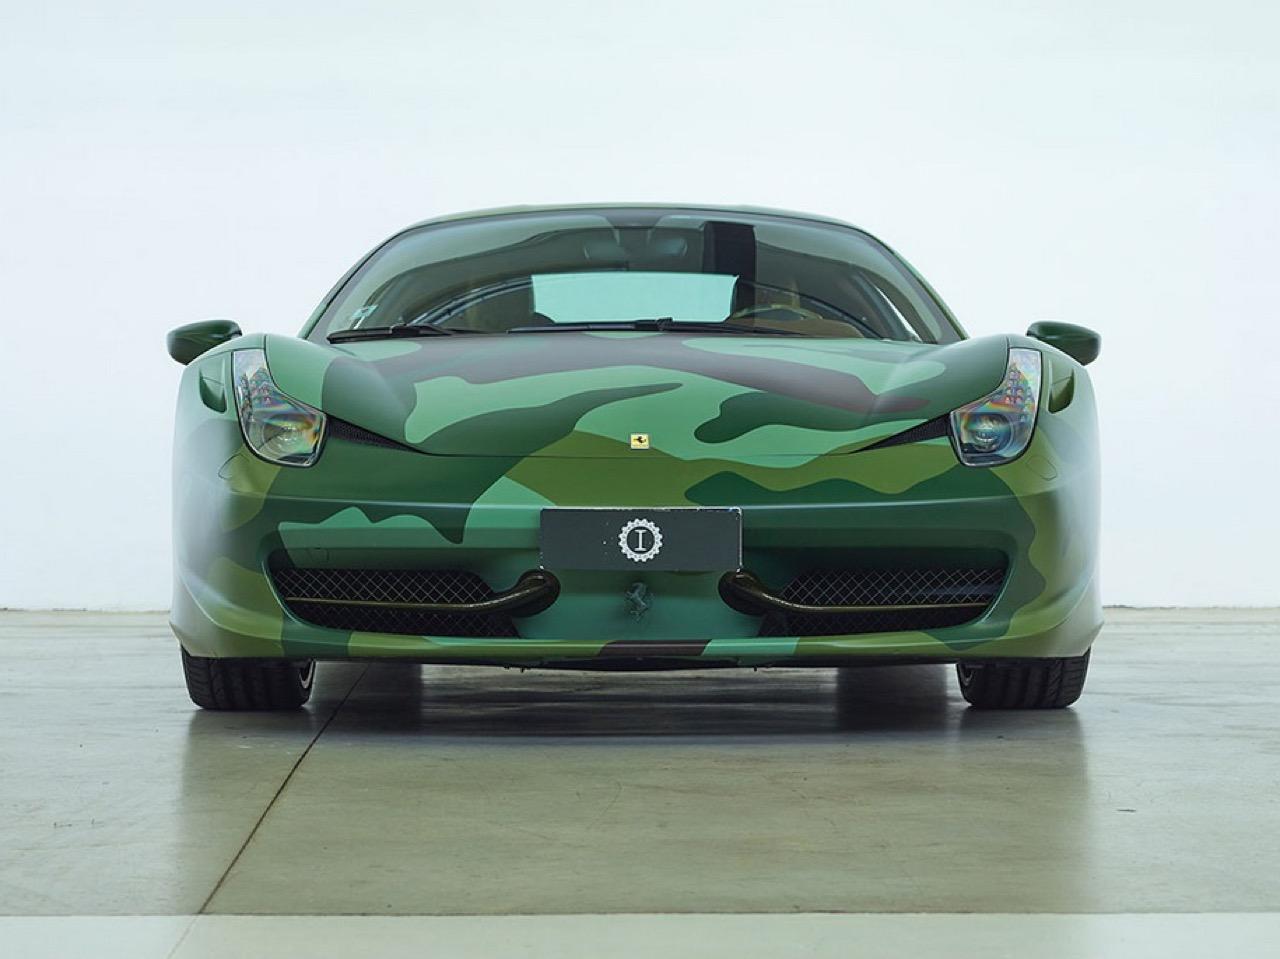 Ferrari 458 Italia Lapo Elkann in auction (3)